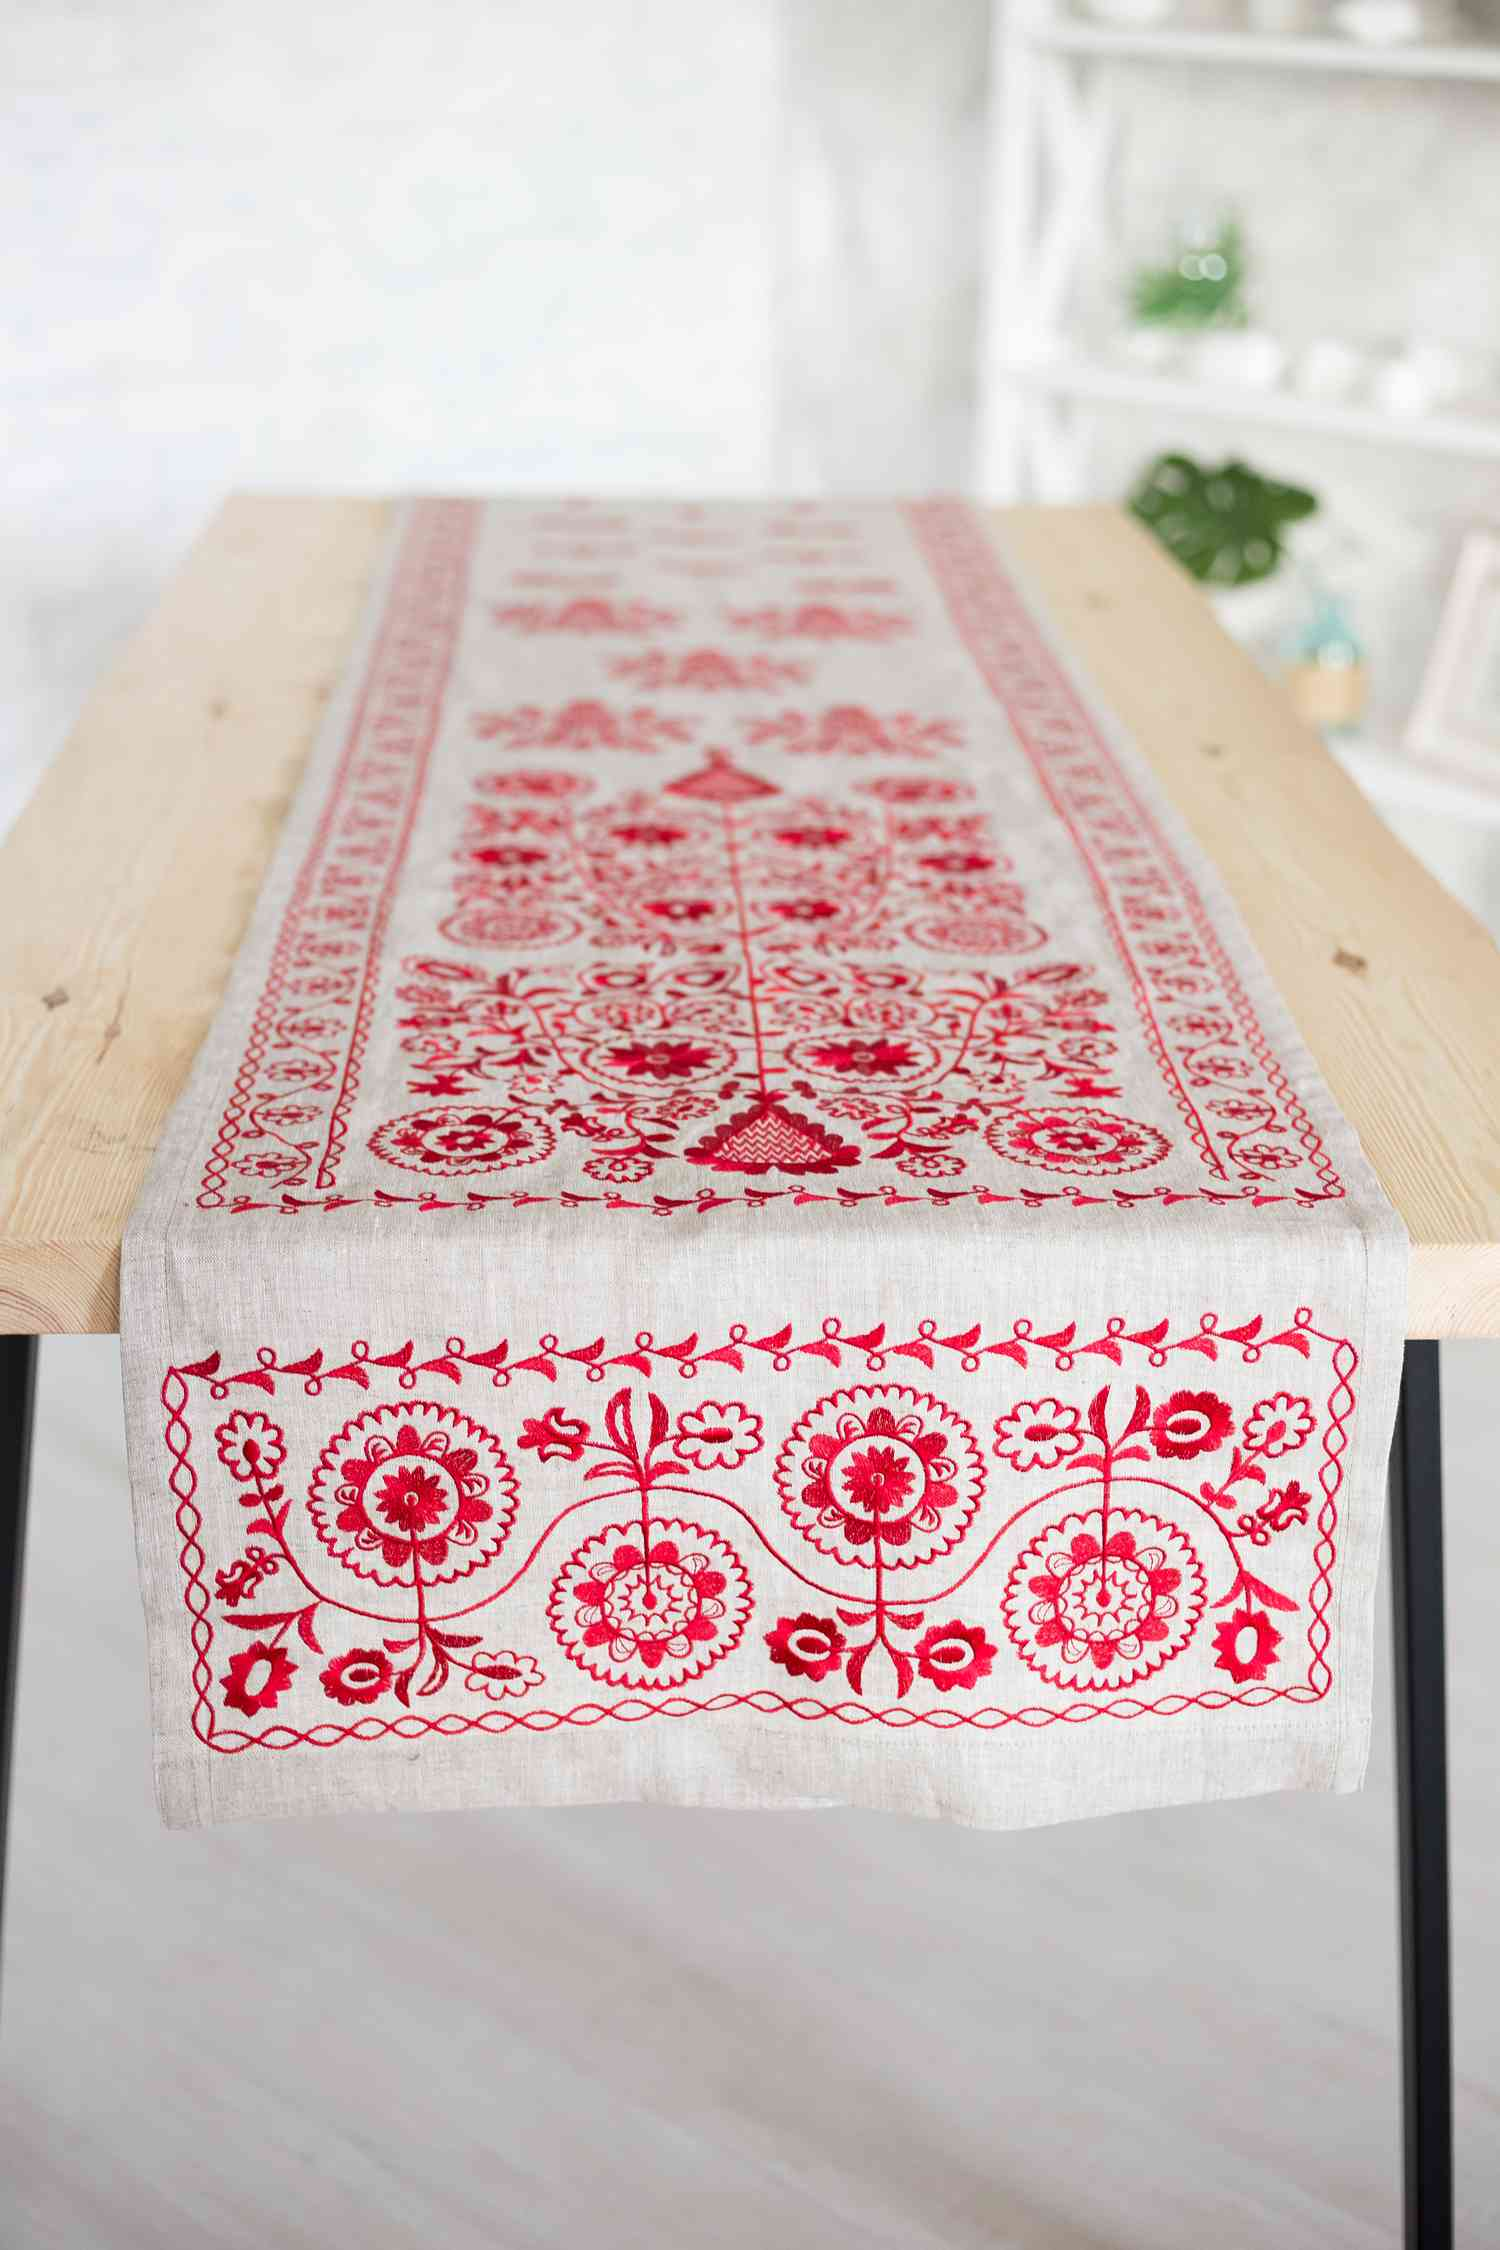 Ukrainian embroidered towels